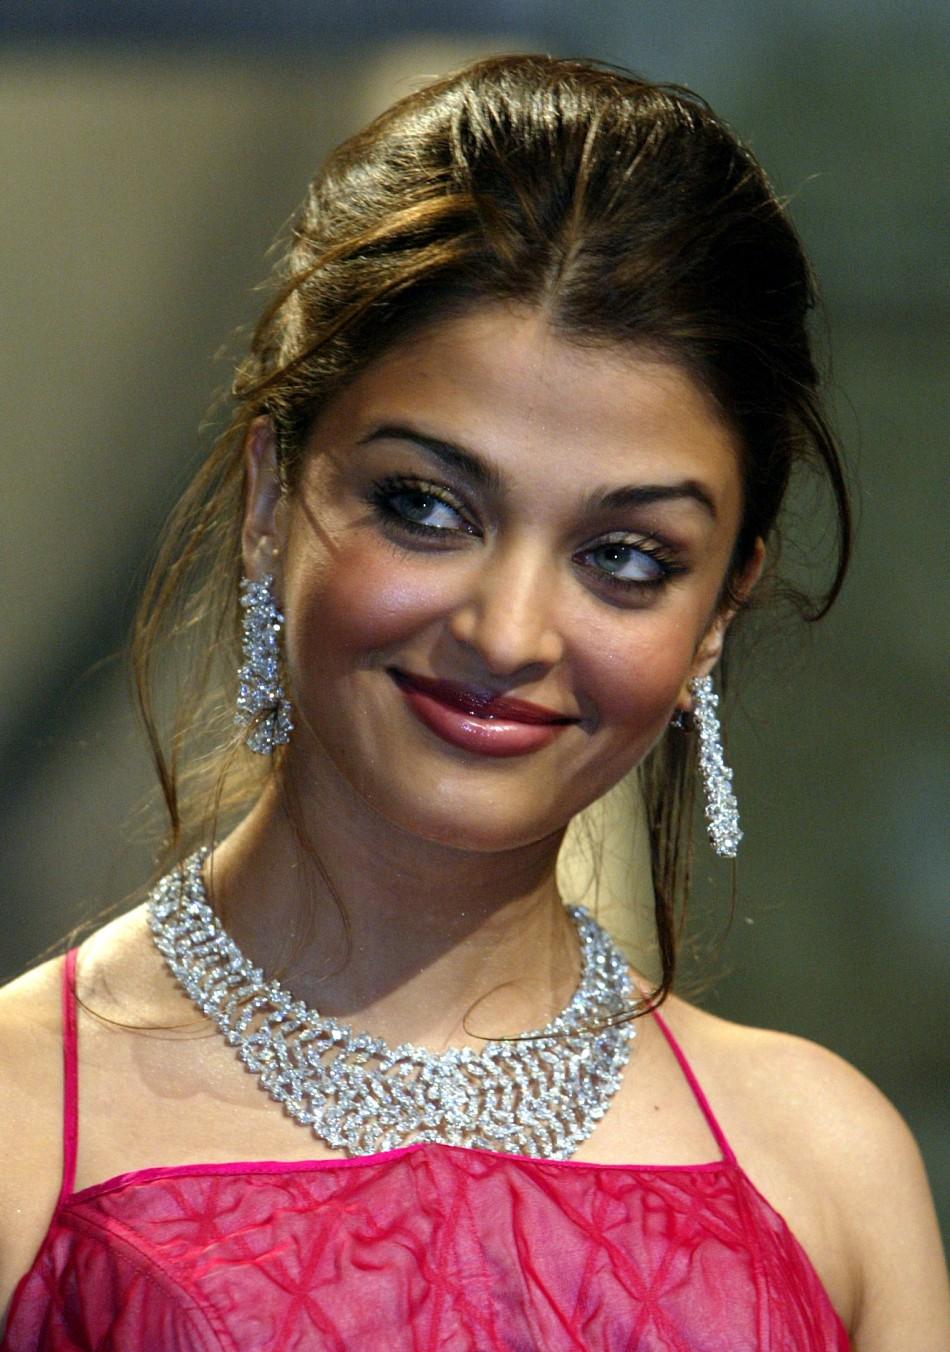 Aishwarya Rai 2003 Jury Member Aishwarya Rai